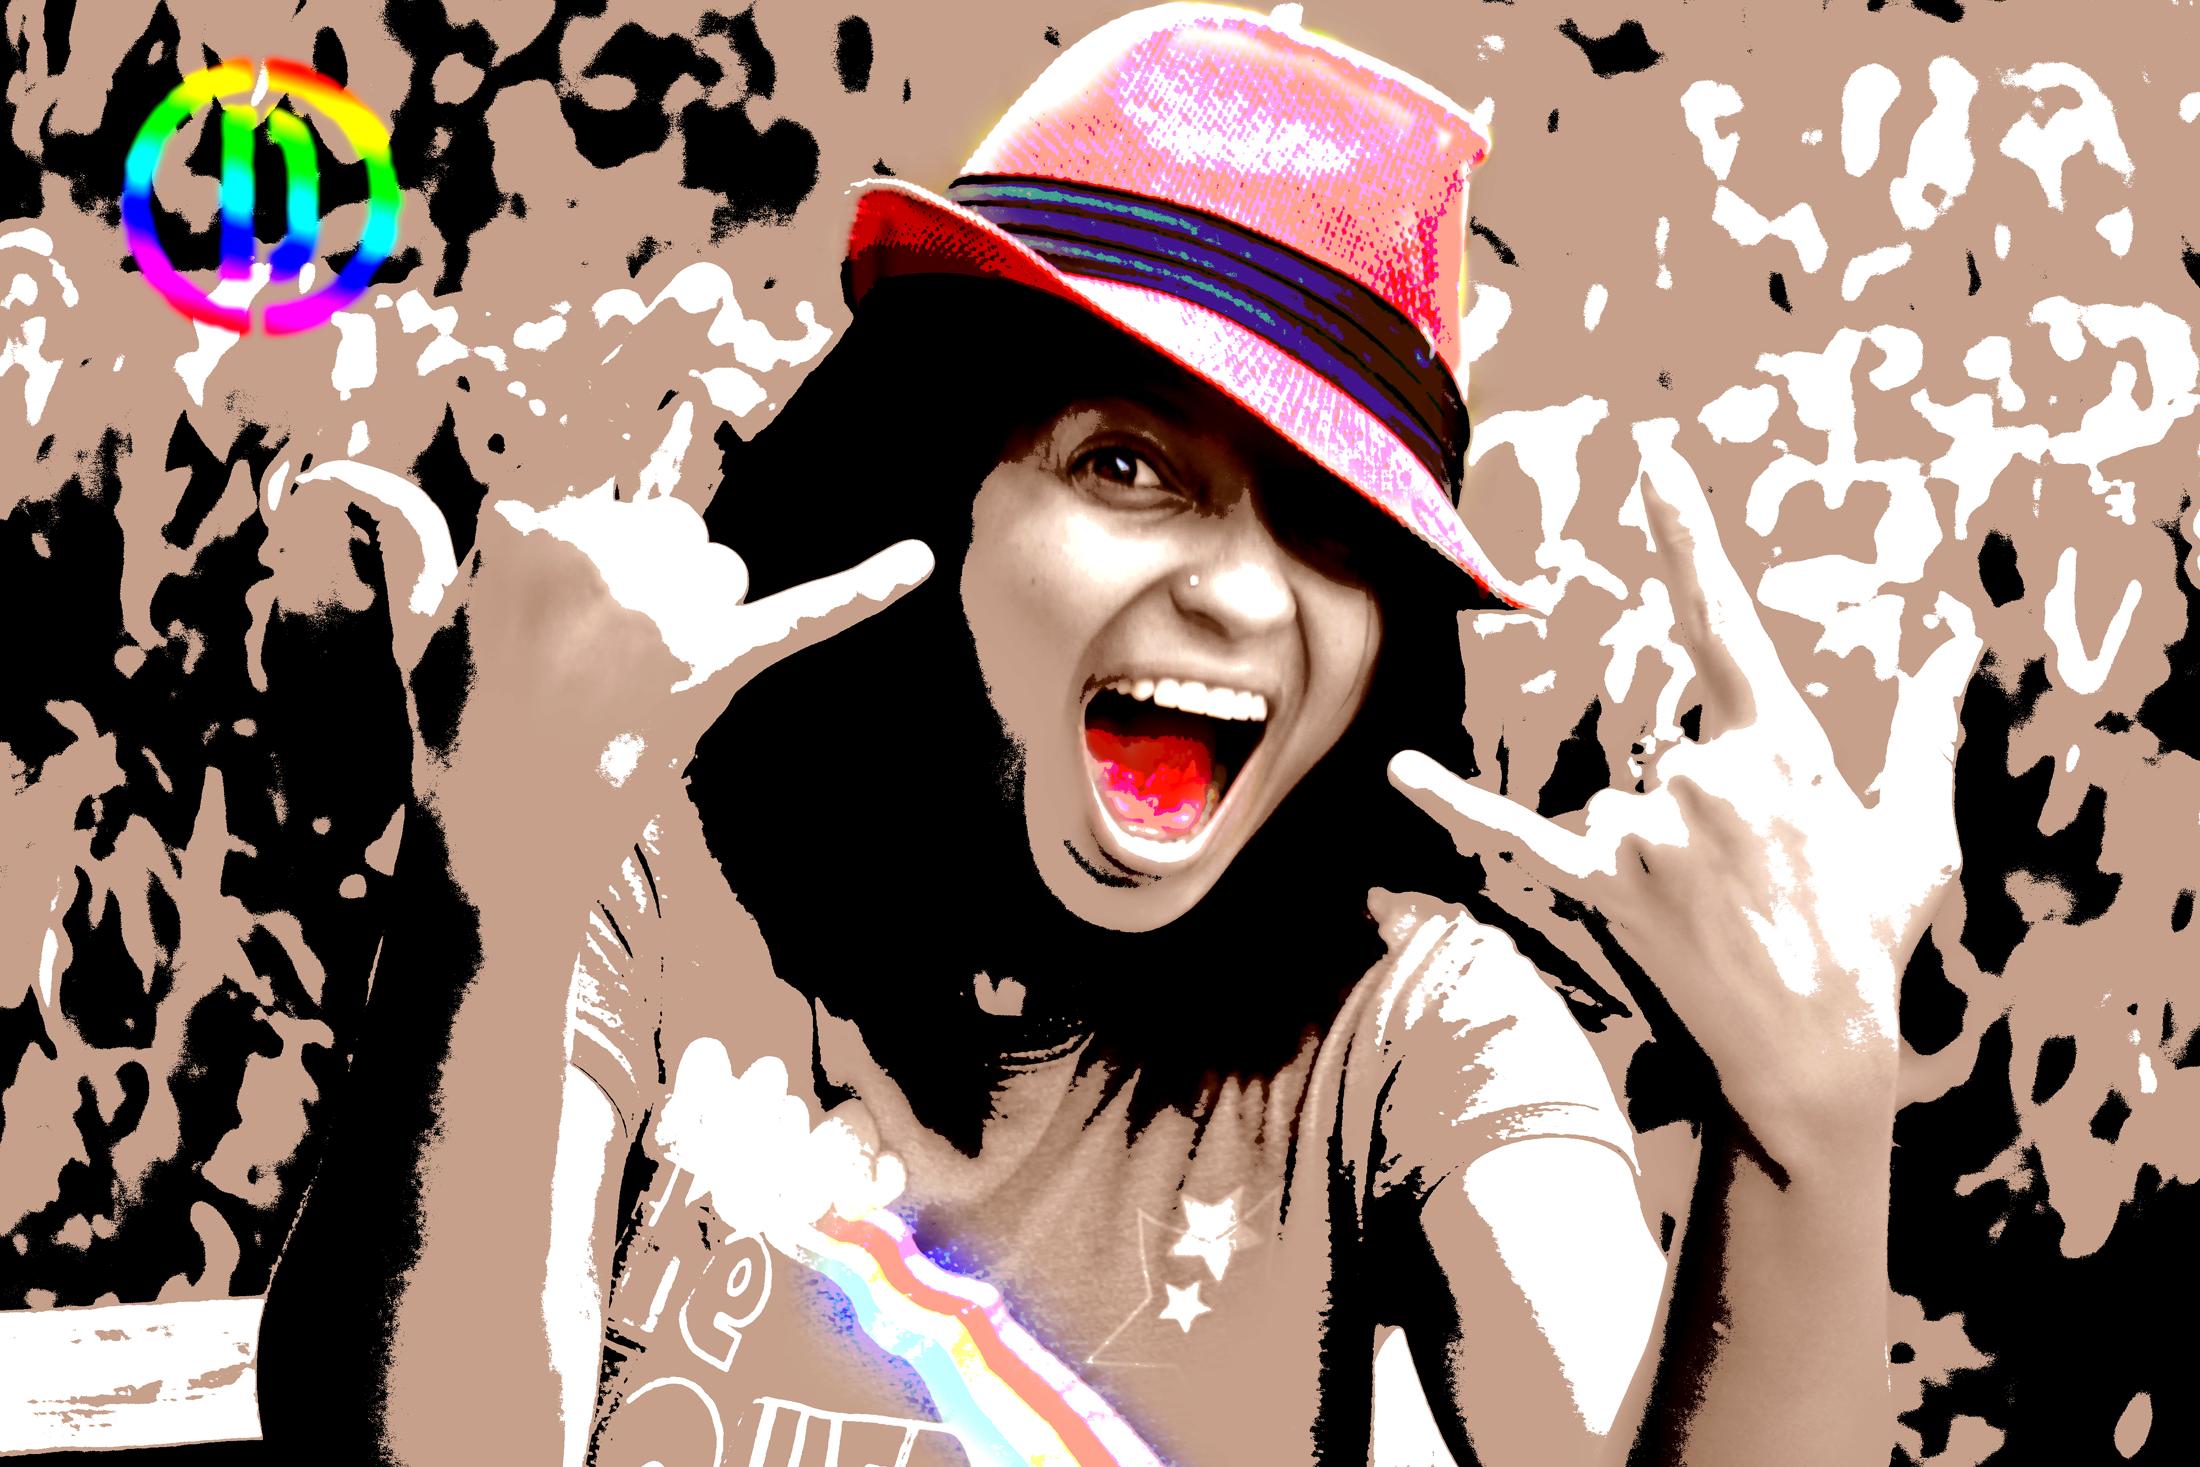 Enjoy Life! Make Art!